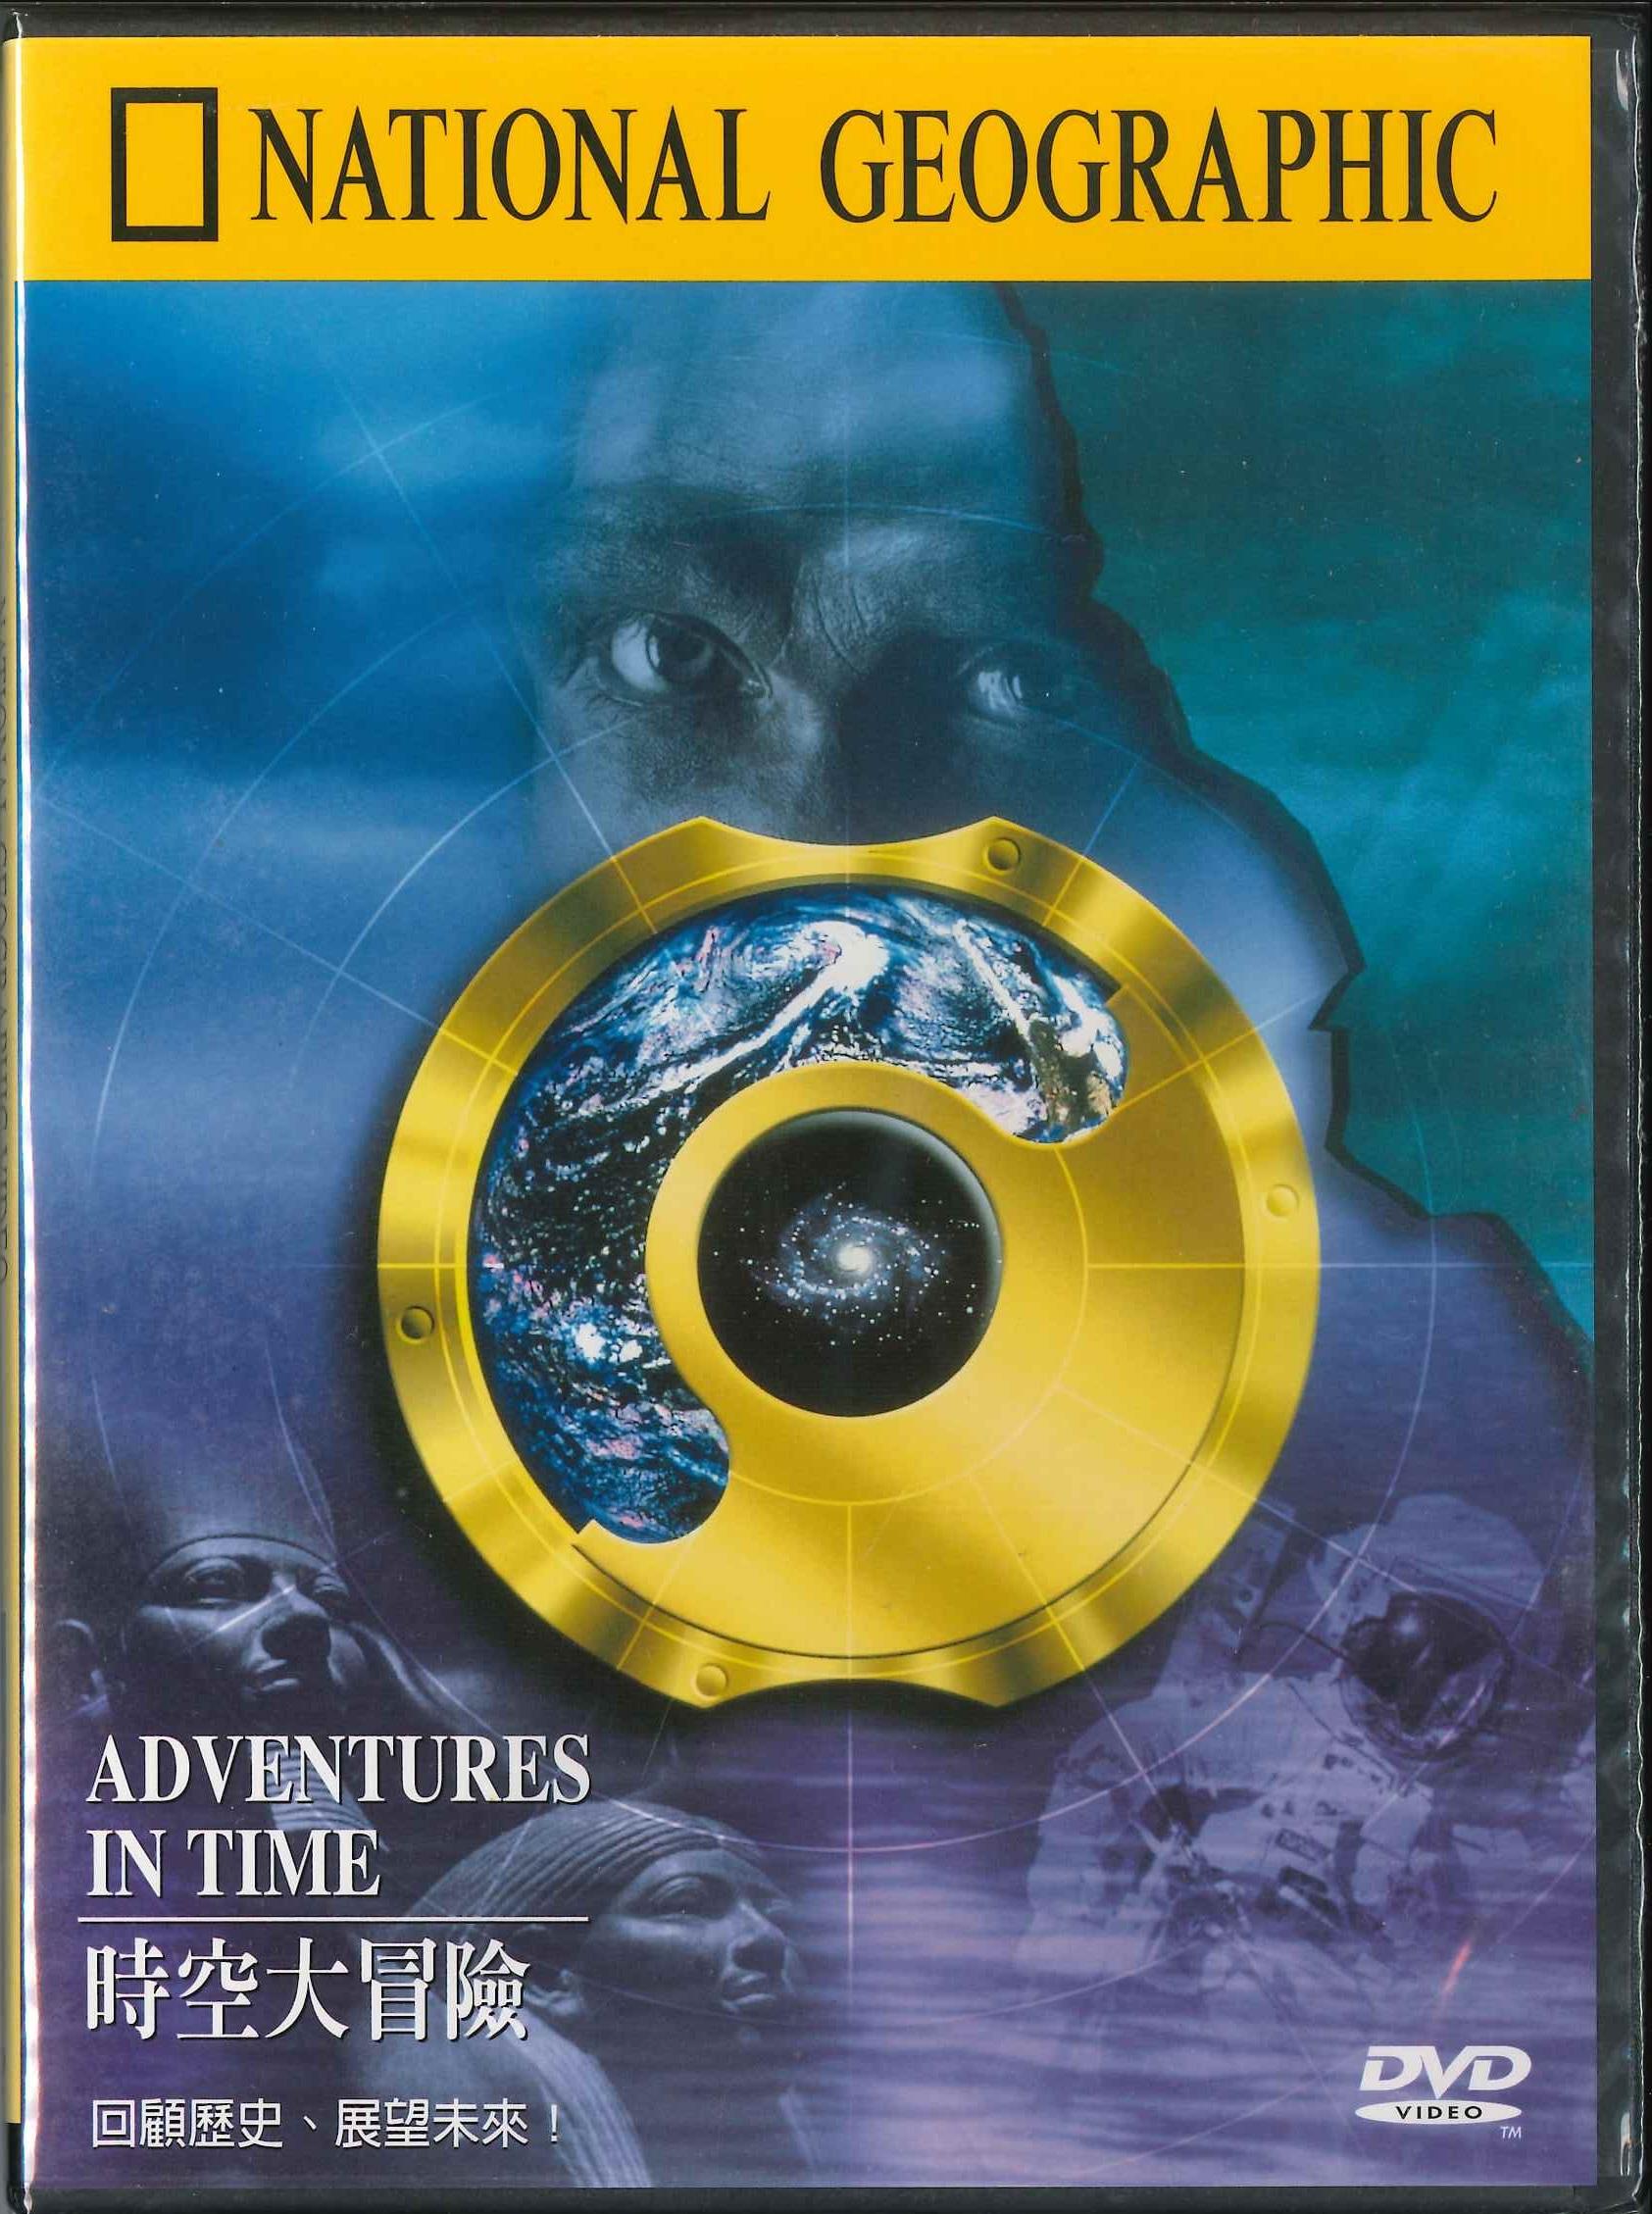 時空大冒險 [錄影資料]=Adventures in time